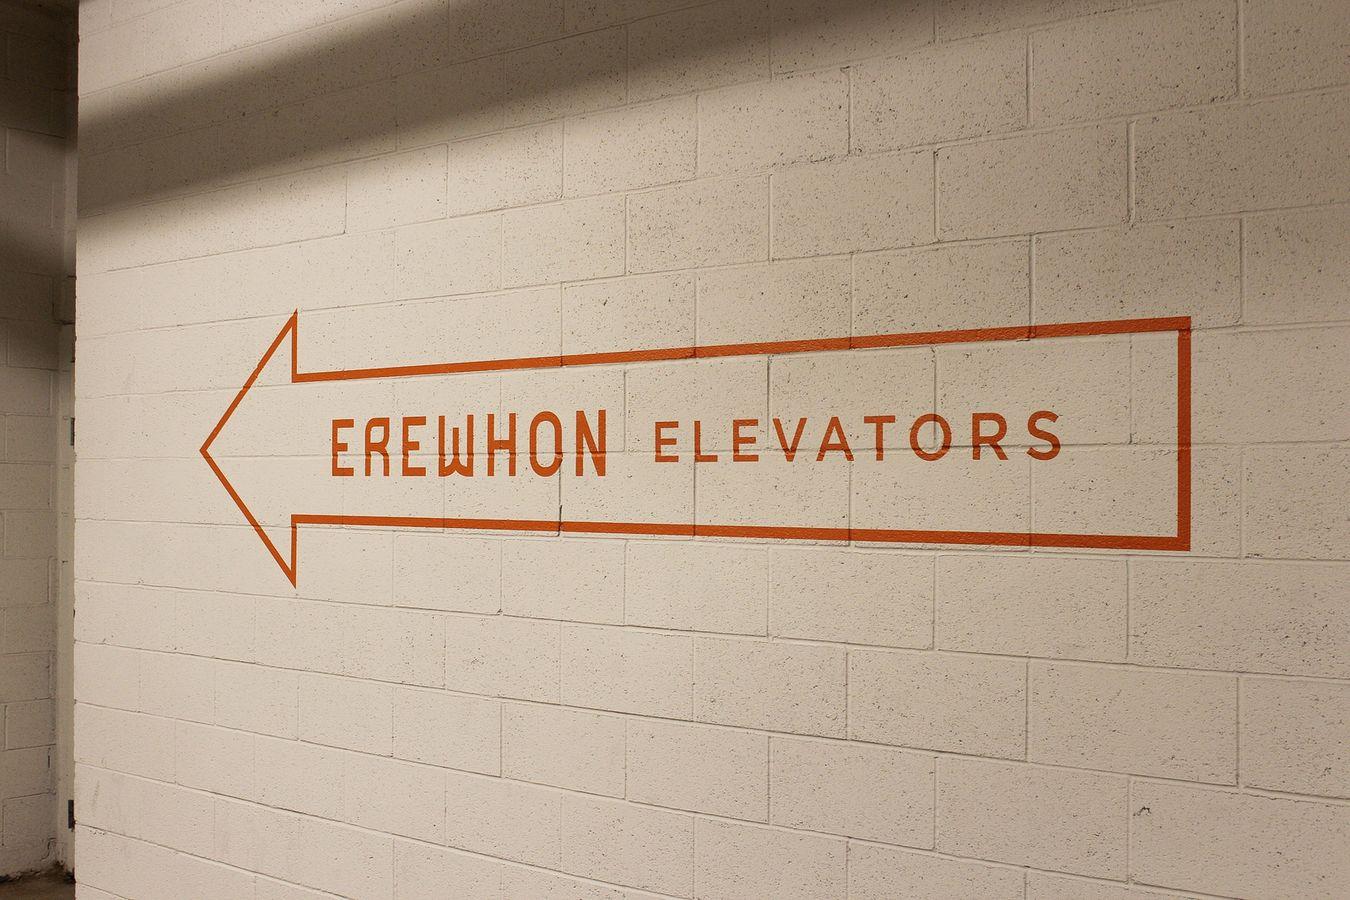 Erewhon elevator directional signs